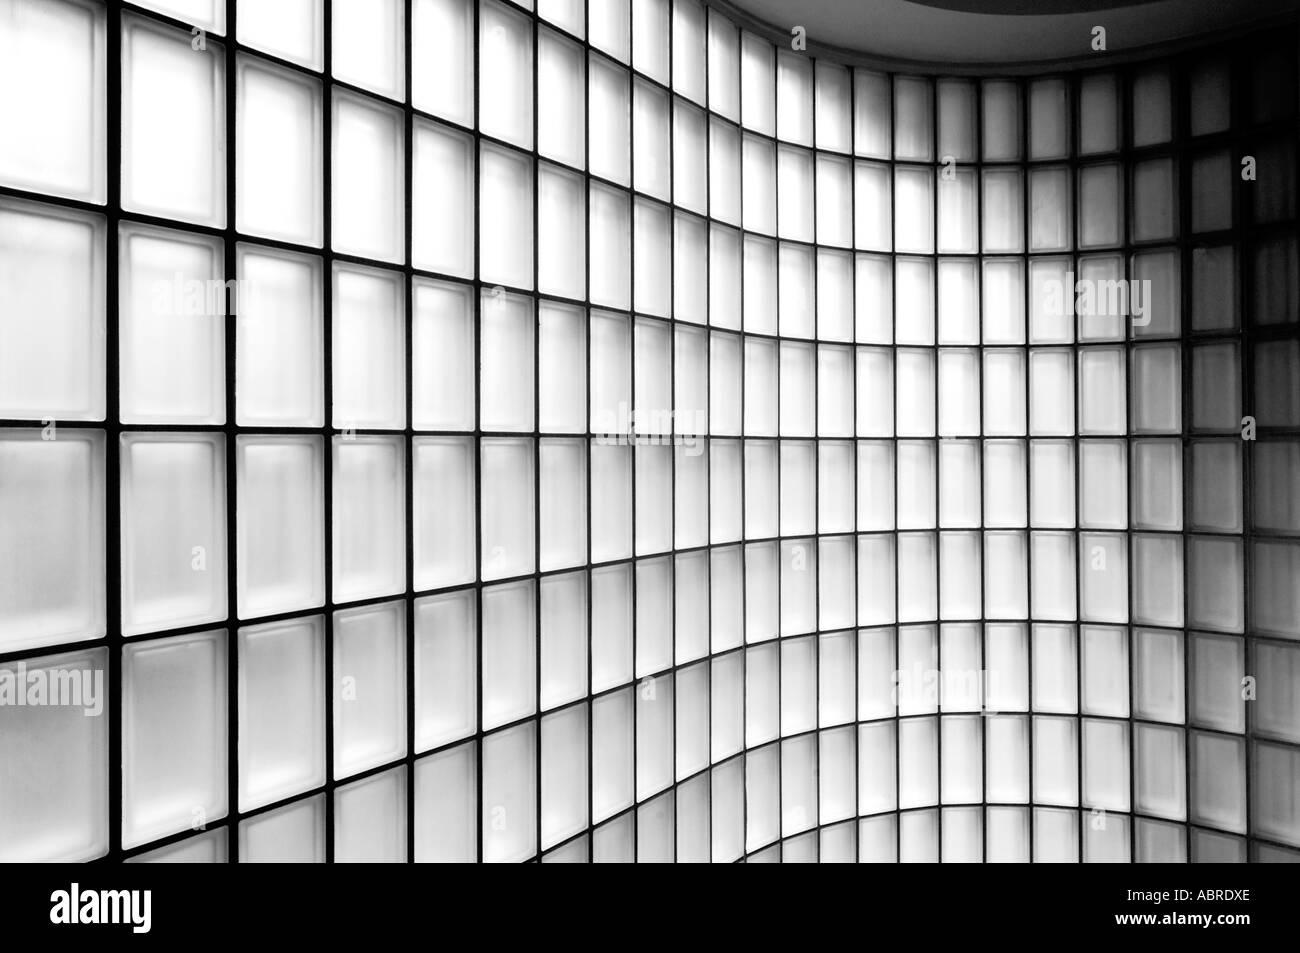 Glass Bricks Wall Design : Small square glass bricks in wall abstract design pattern